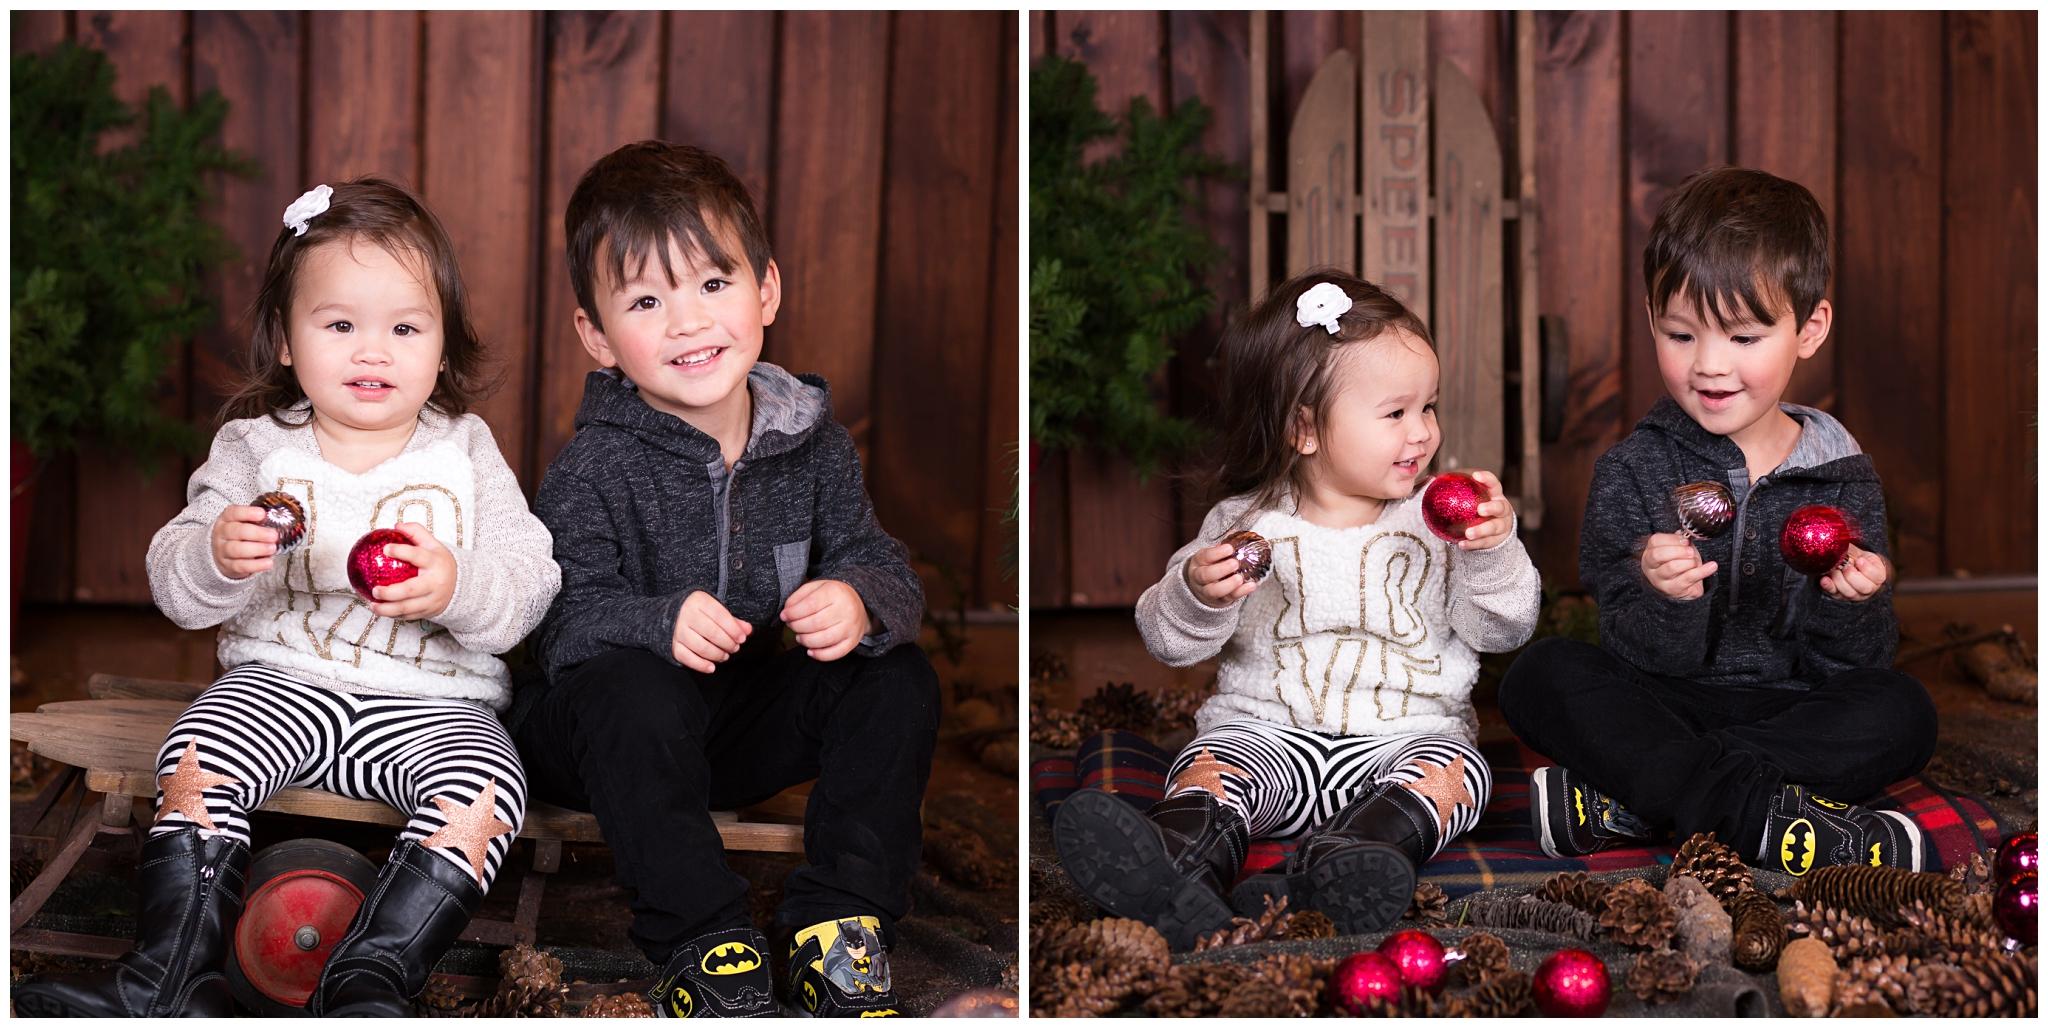 ChristmasMiniSessions_family-baby-kids_Berks-County-Reading-PA_0046.jpg